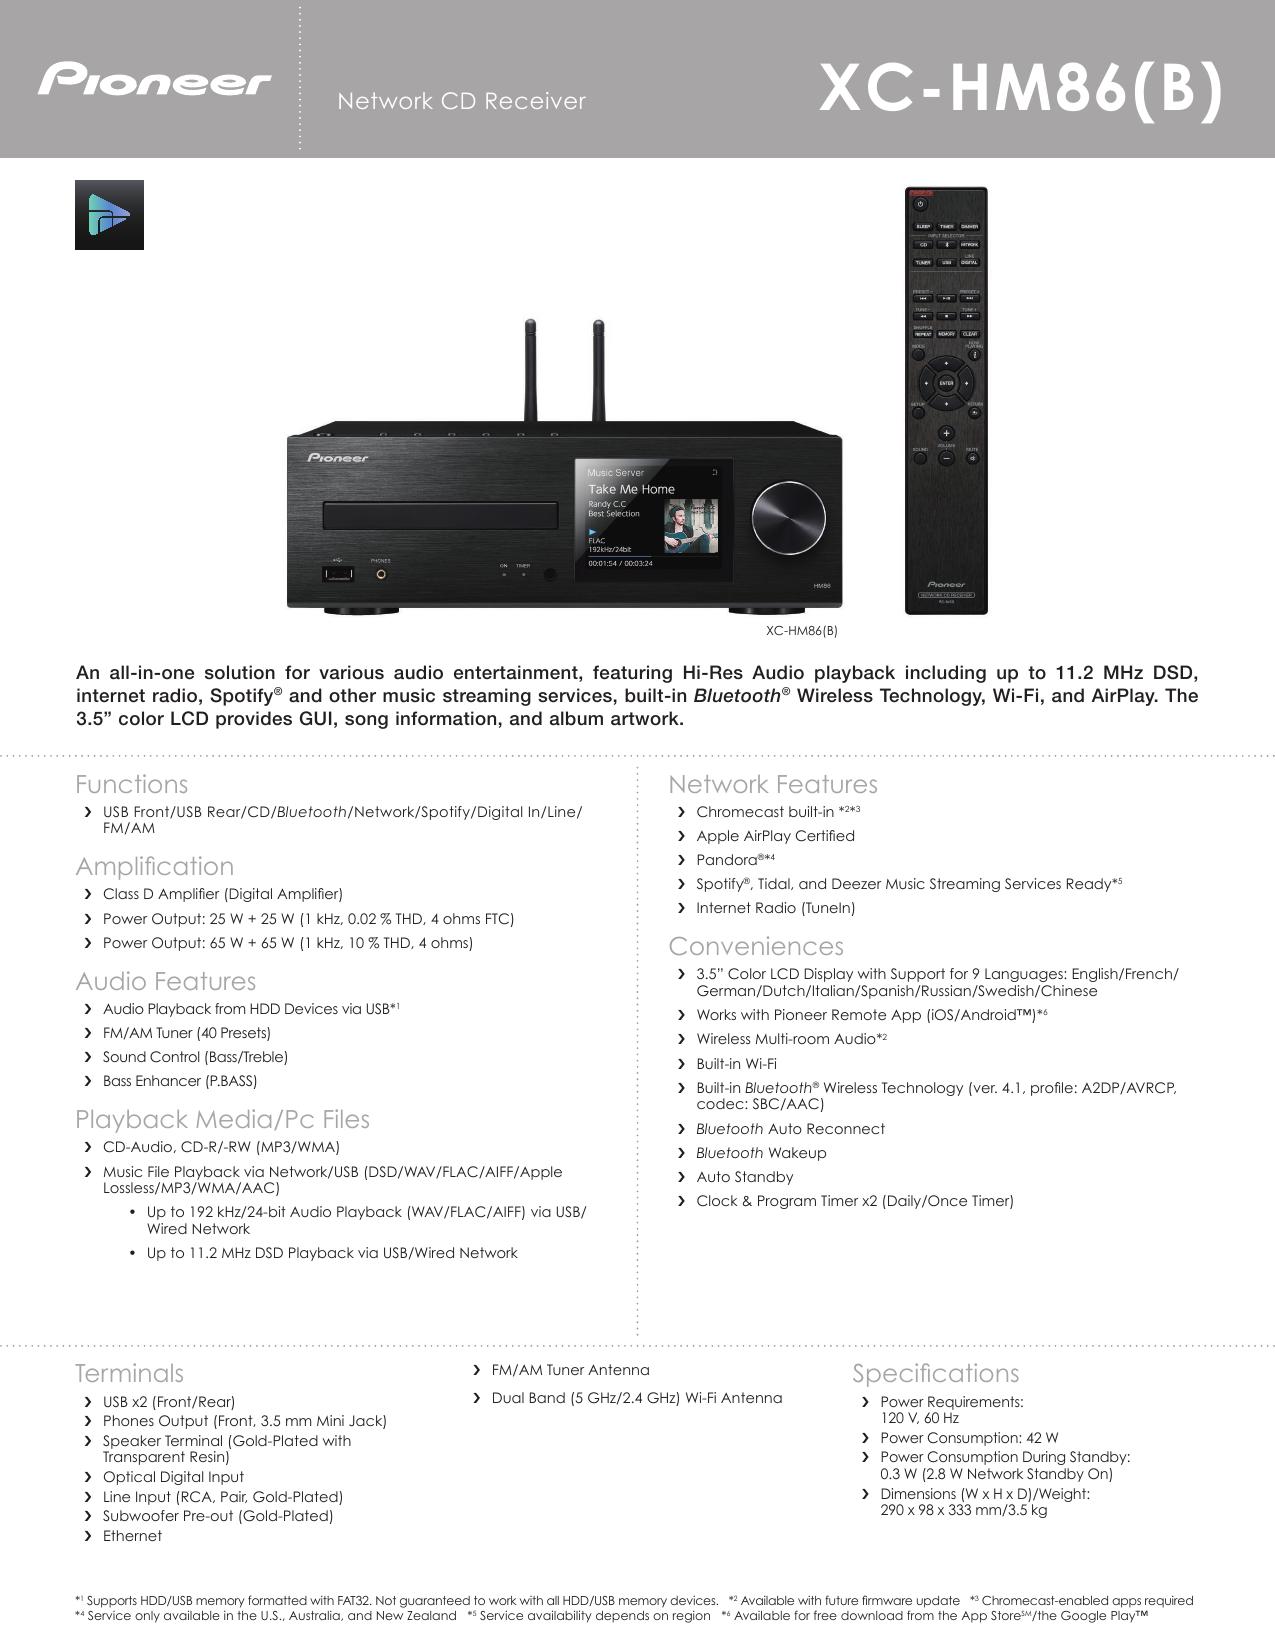 XC-HM86(B) - Pioneer Electronics USA | manualzz com